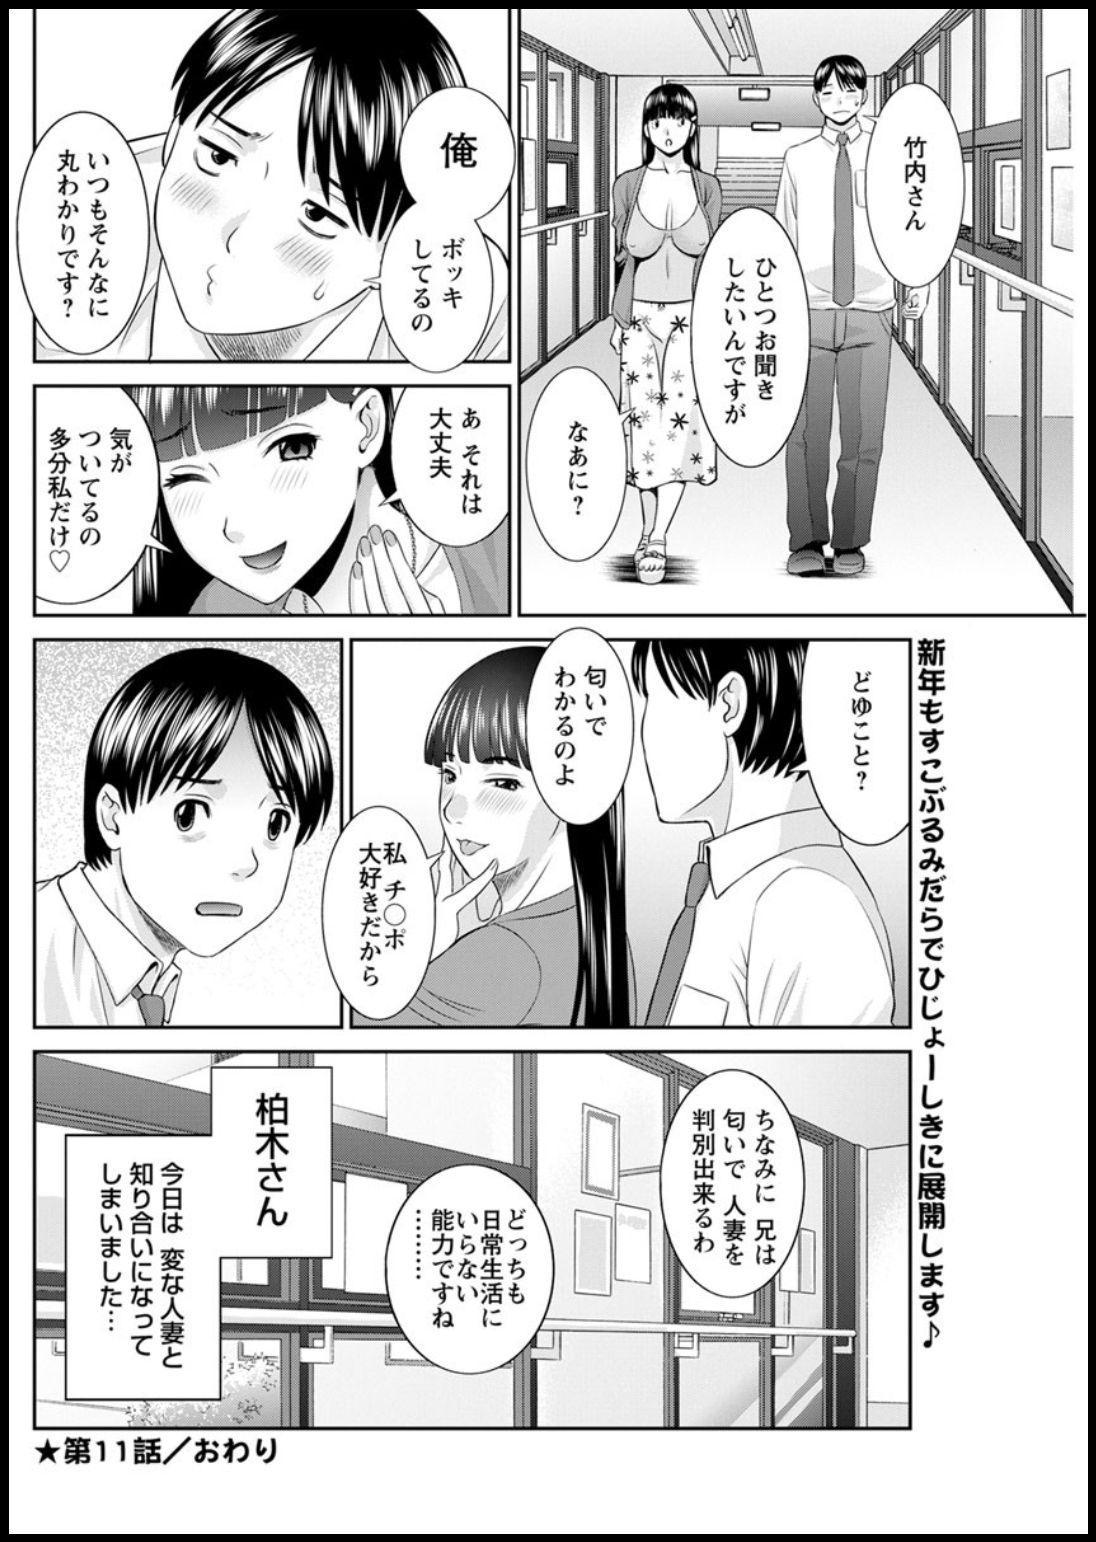 [Kawamori Misaki] Kaikan Hitotsuma Gakuen Ch. 1-6, 8-20 [Digital] 185